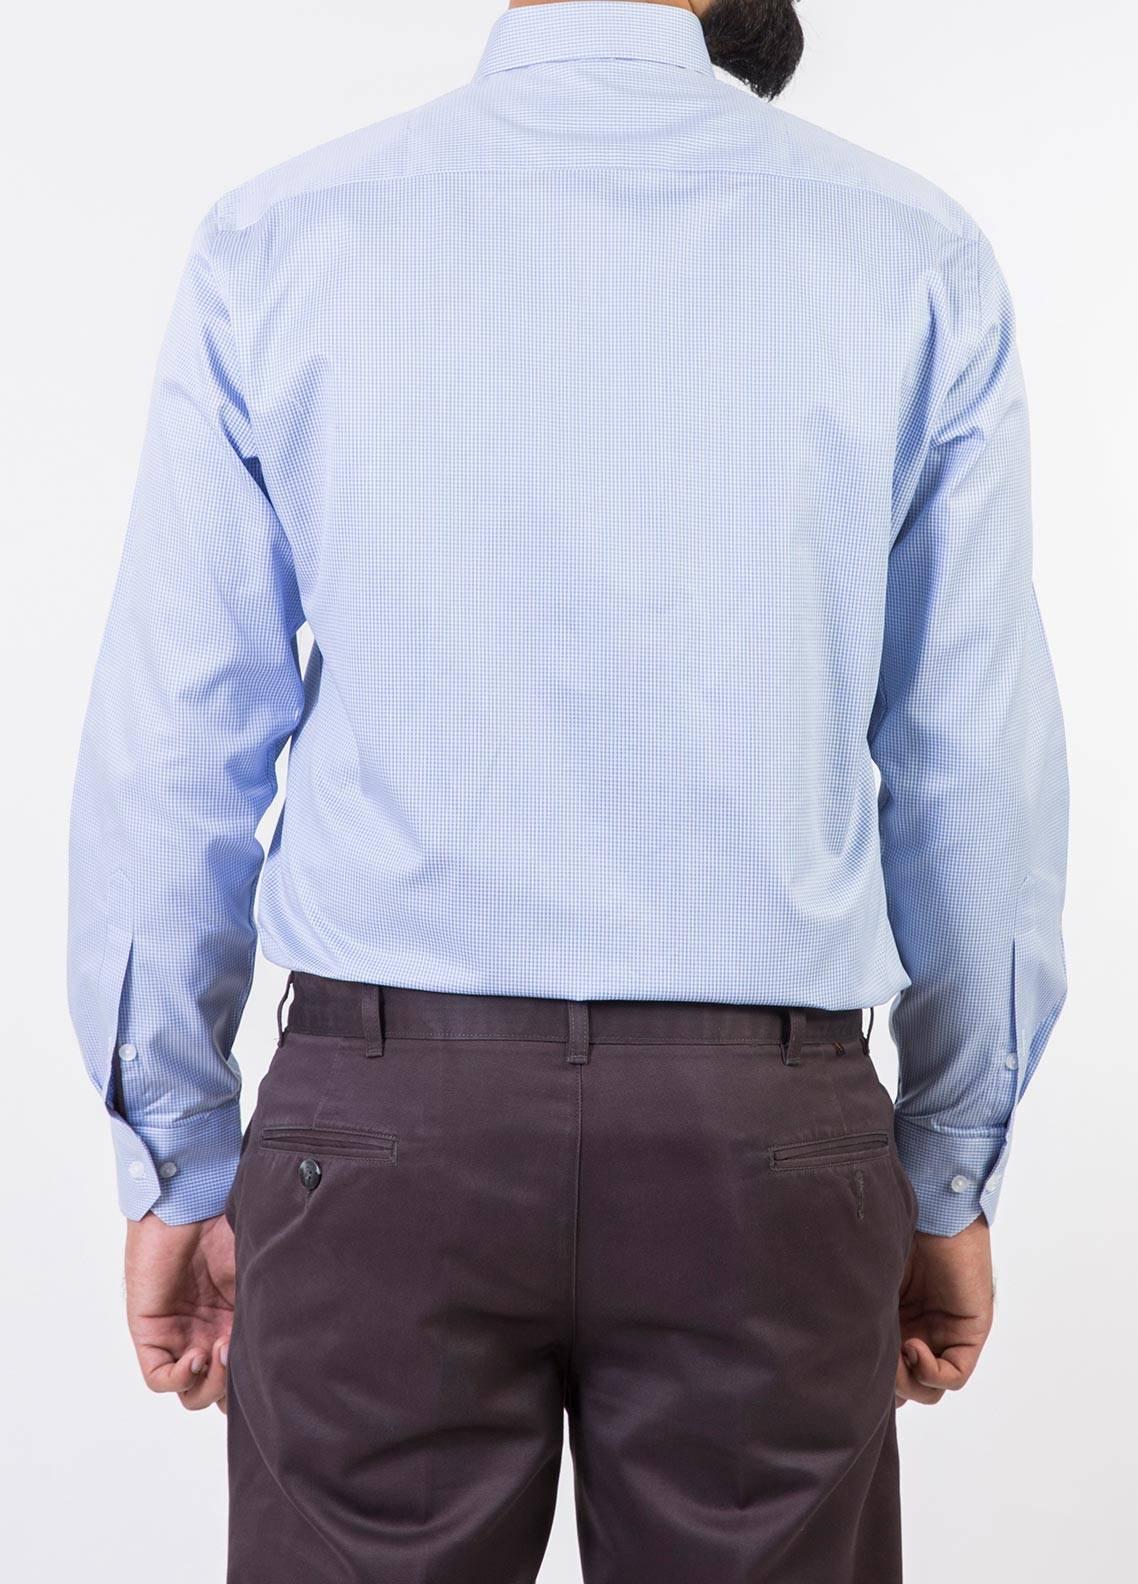 Bien Habille Cotton Formal Shirts for Men -  White & Blue Checks